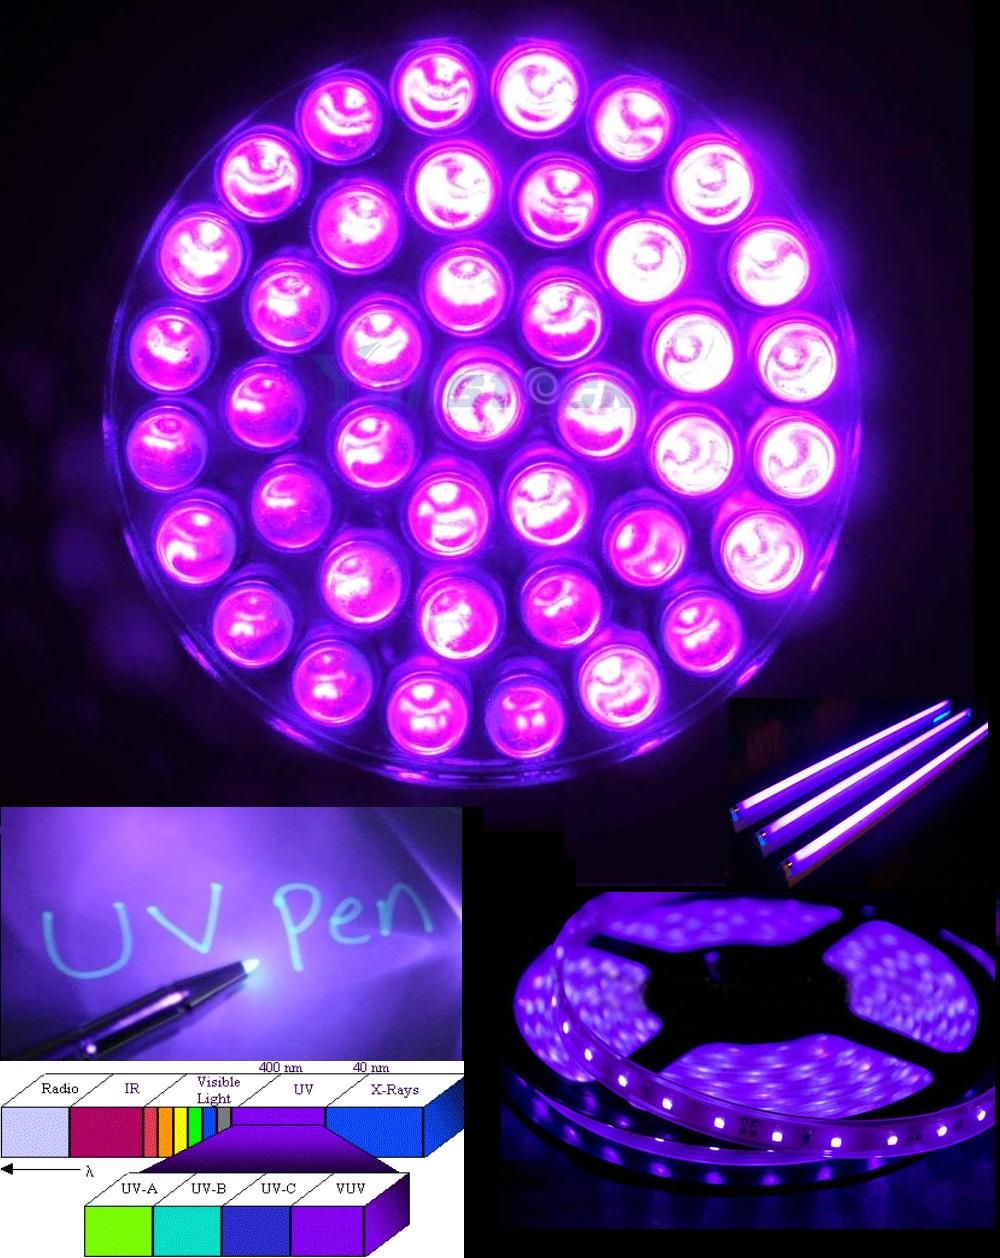 linterna-41-led-luz-ultravioleta-multiples-usos-5441-MLA4376510454_052013-F